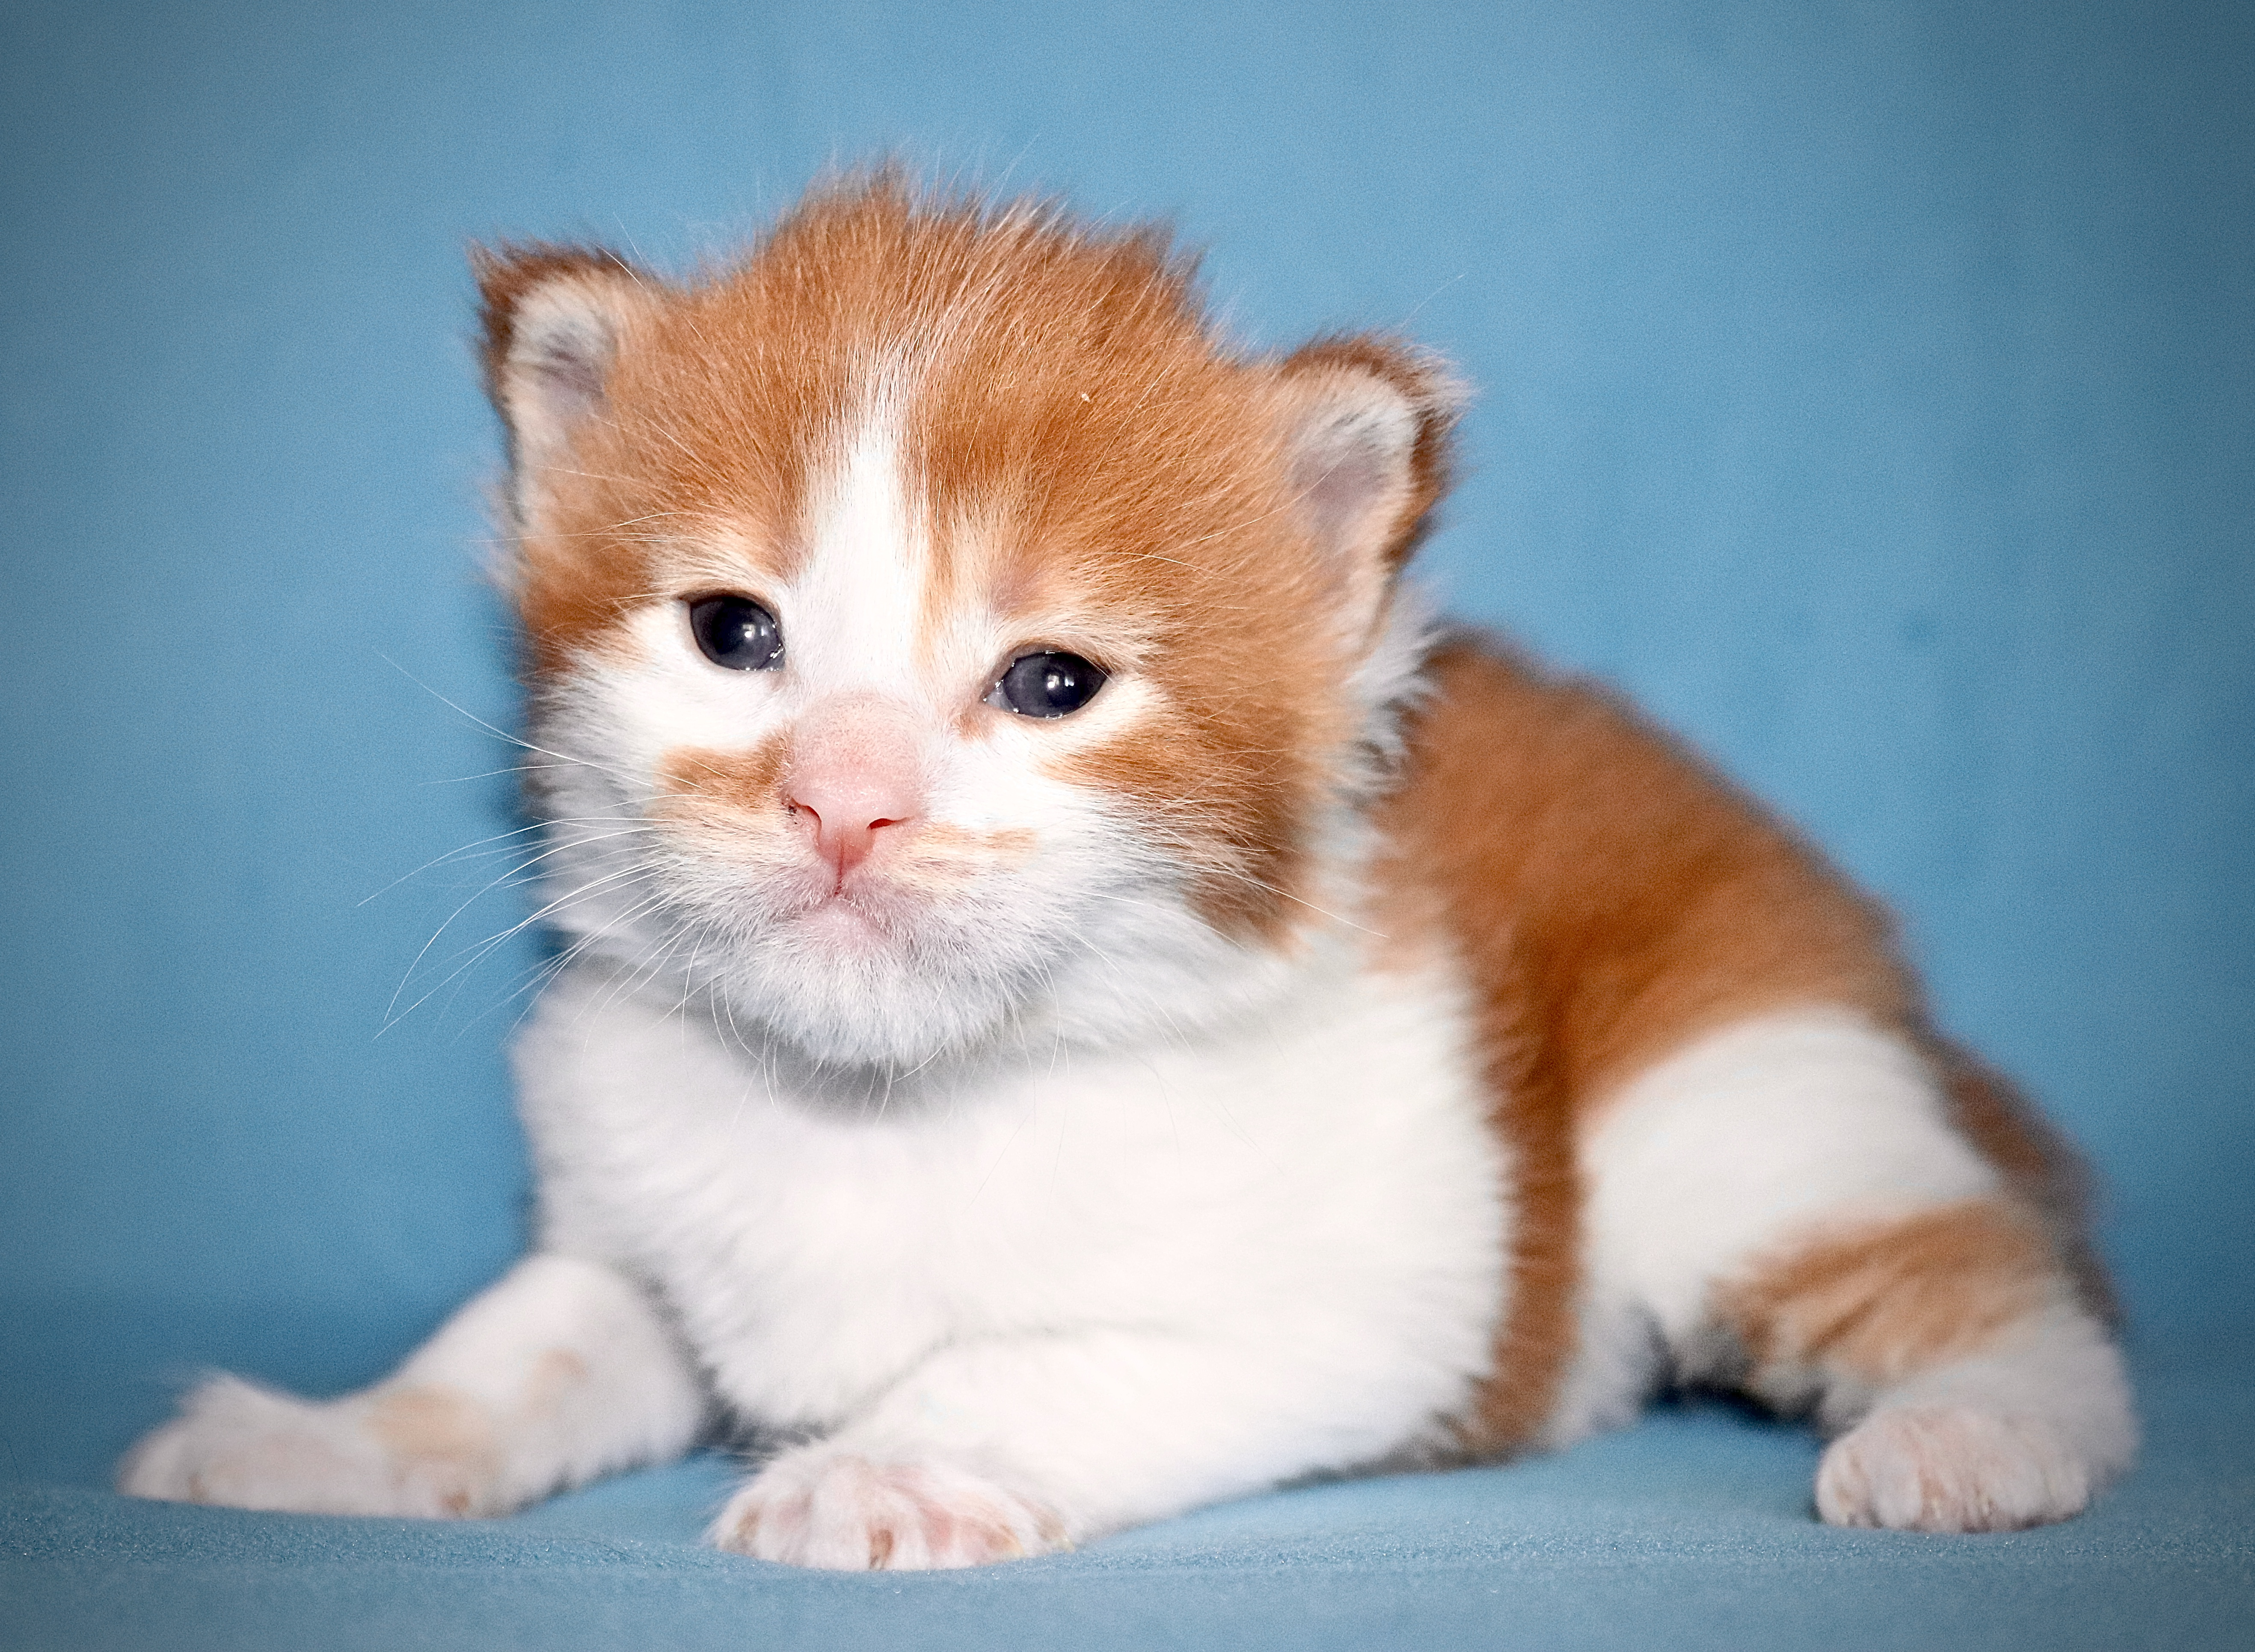 fotka kočky VRH J: JONATHAN VON ERILLIAN*CZ